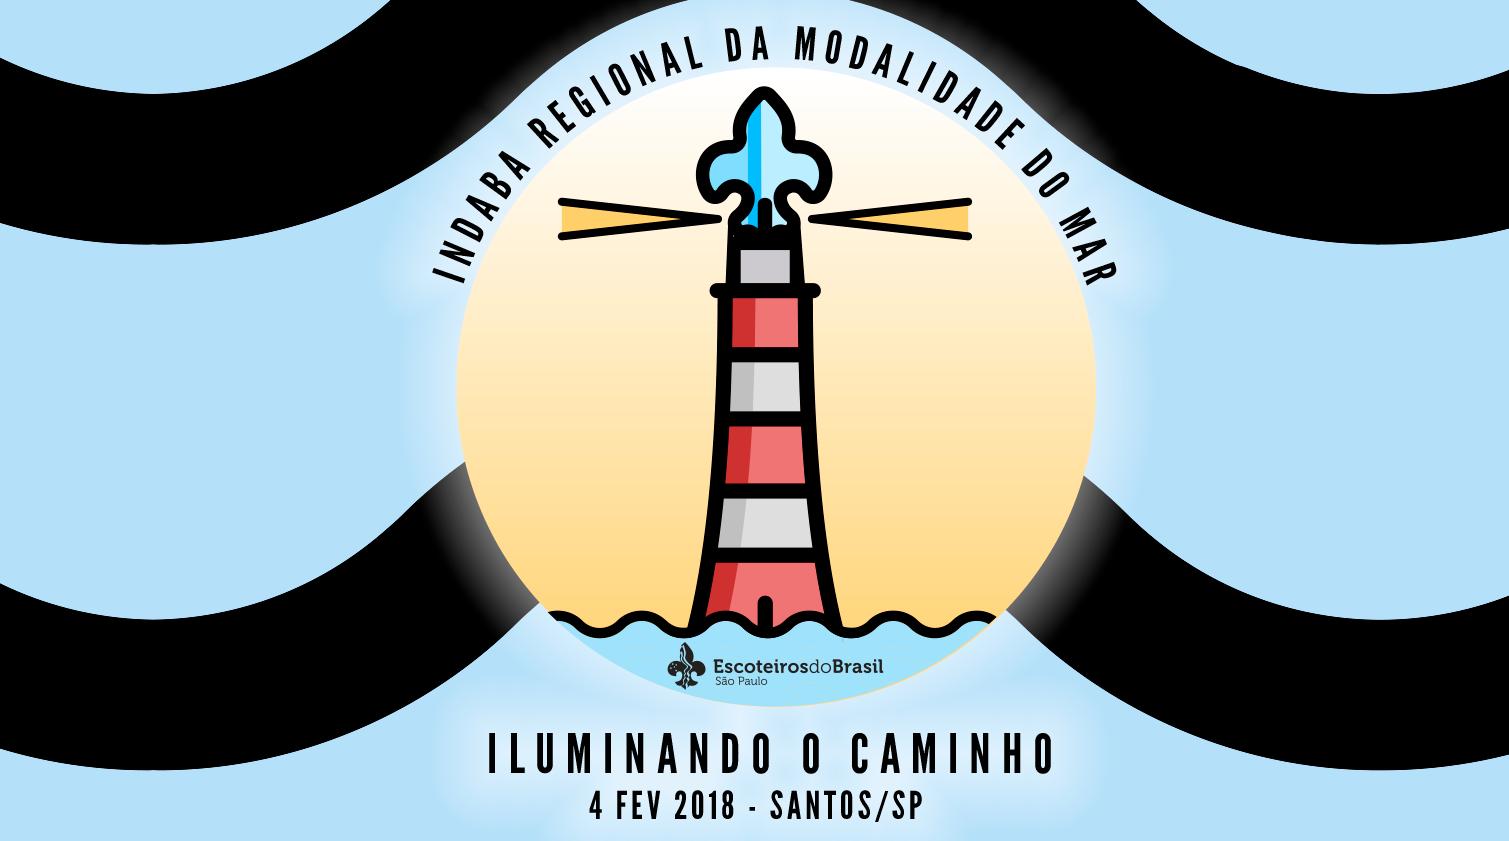 Indaba Regional do Mar 2018 – Iluminando o Caminho